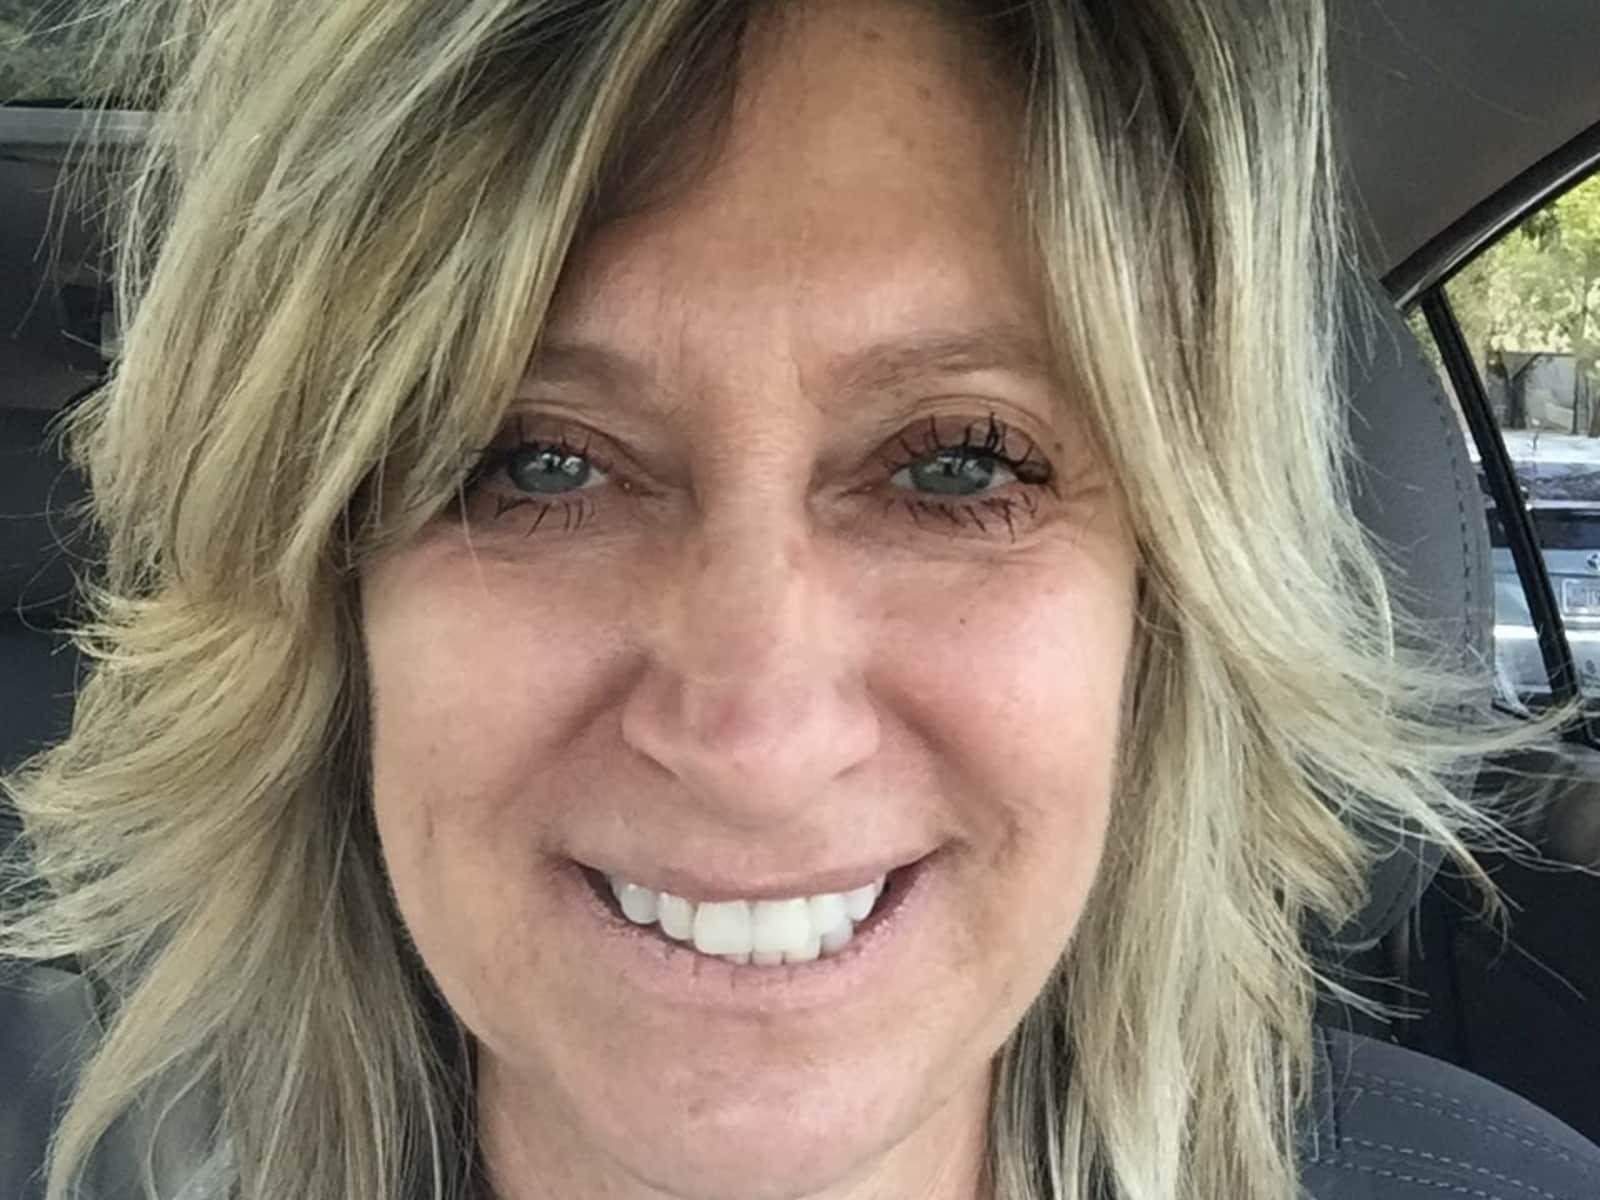 Tina from Paradise Valley, Arizona, United States